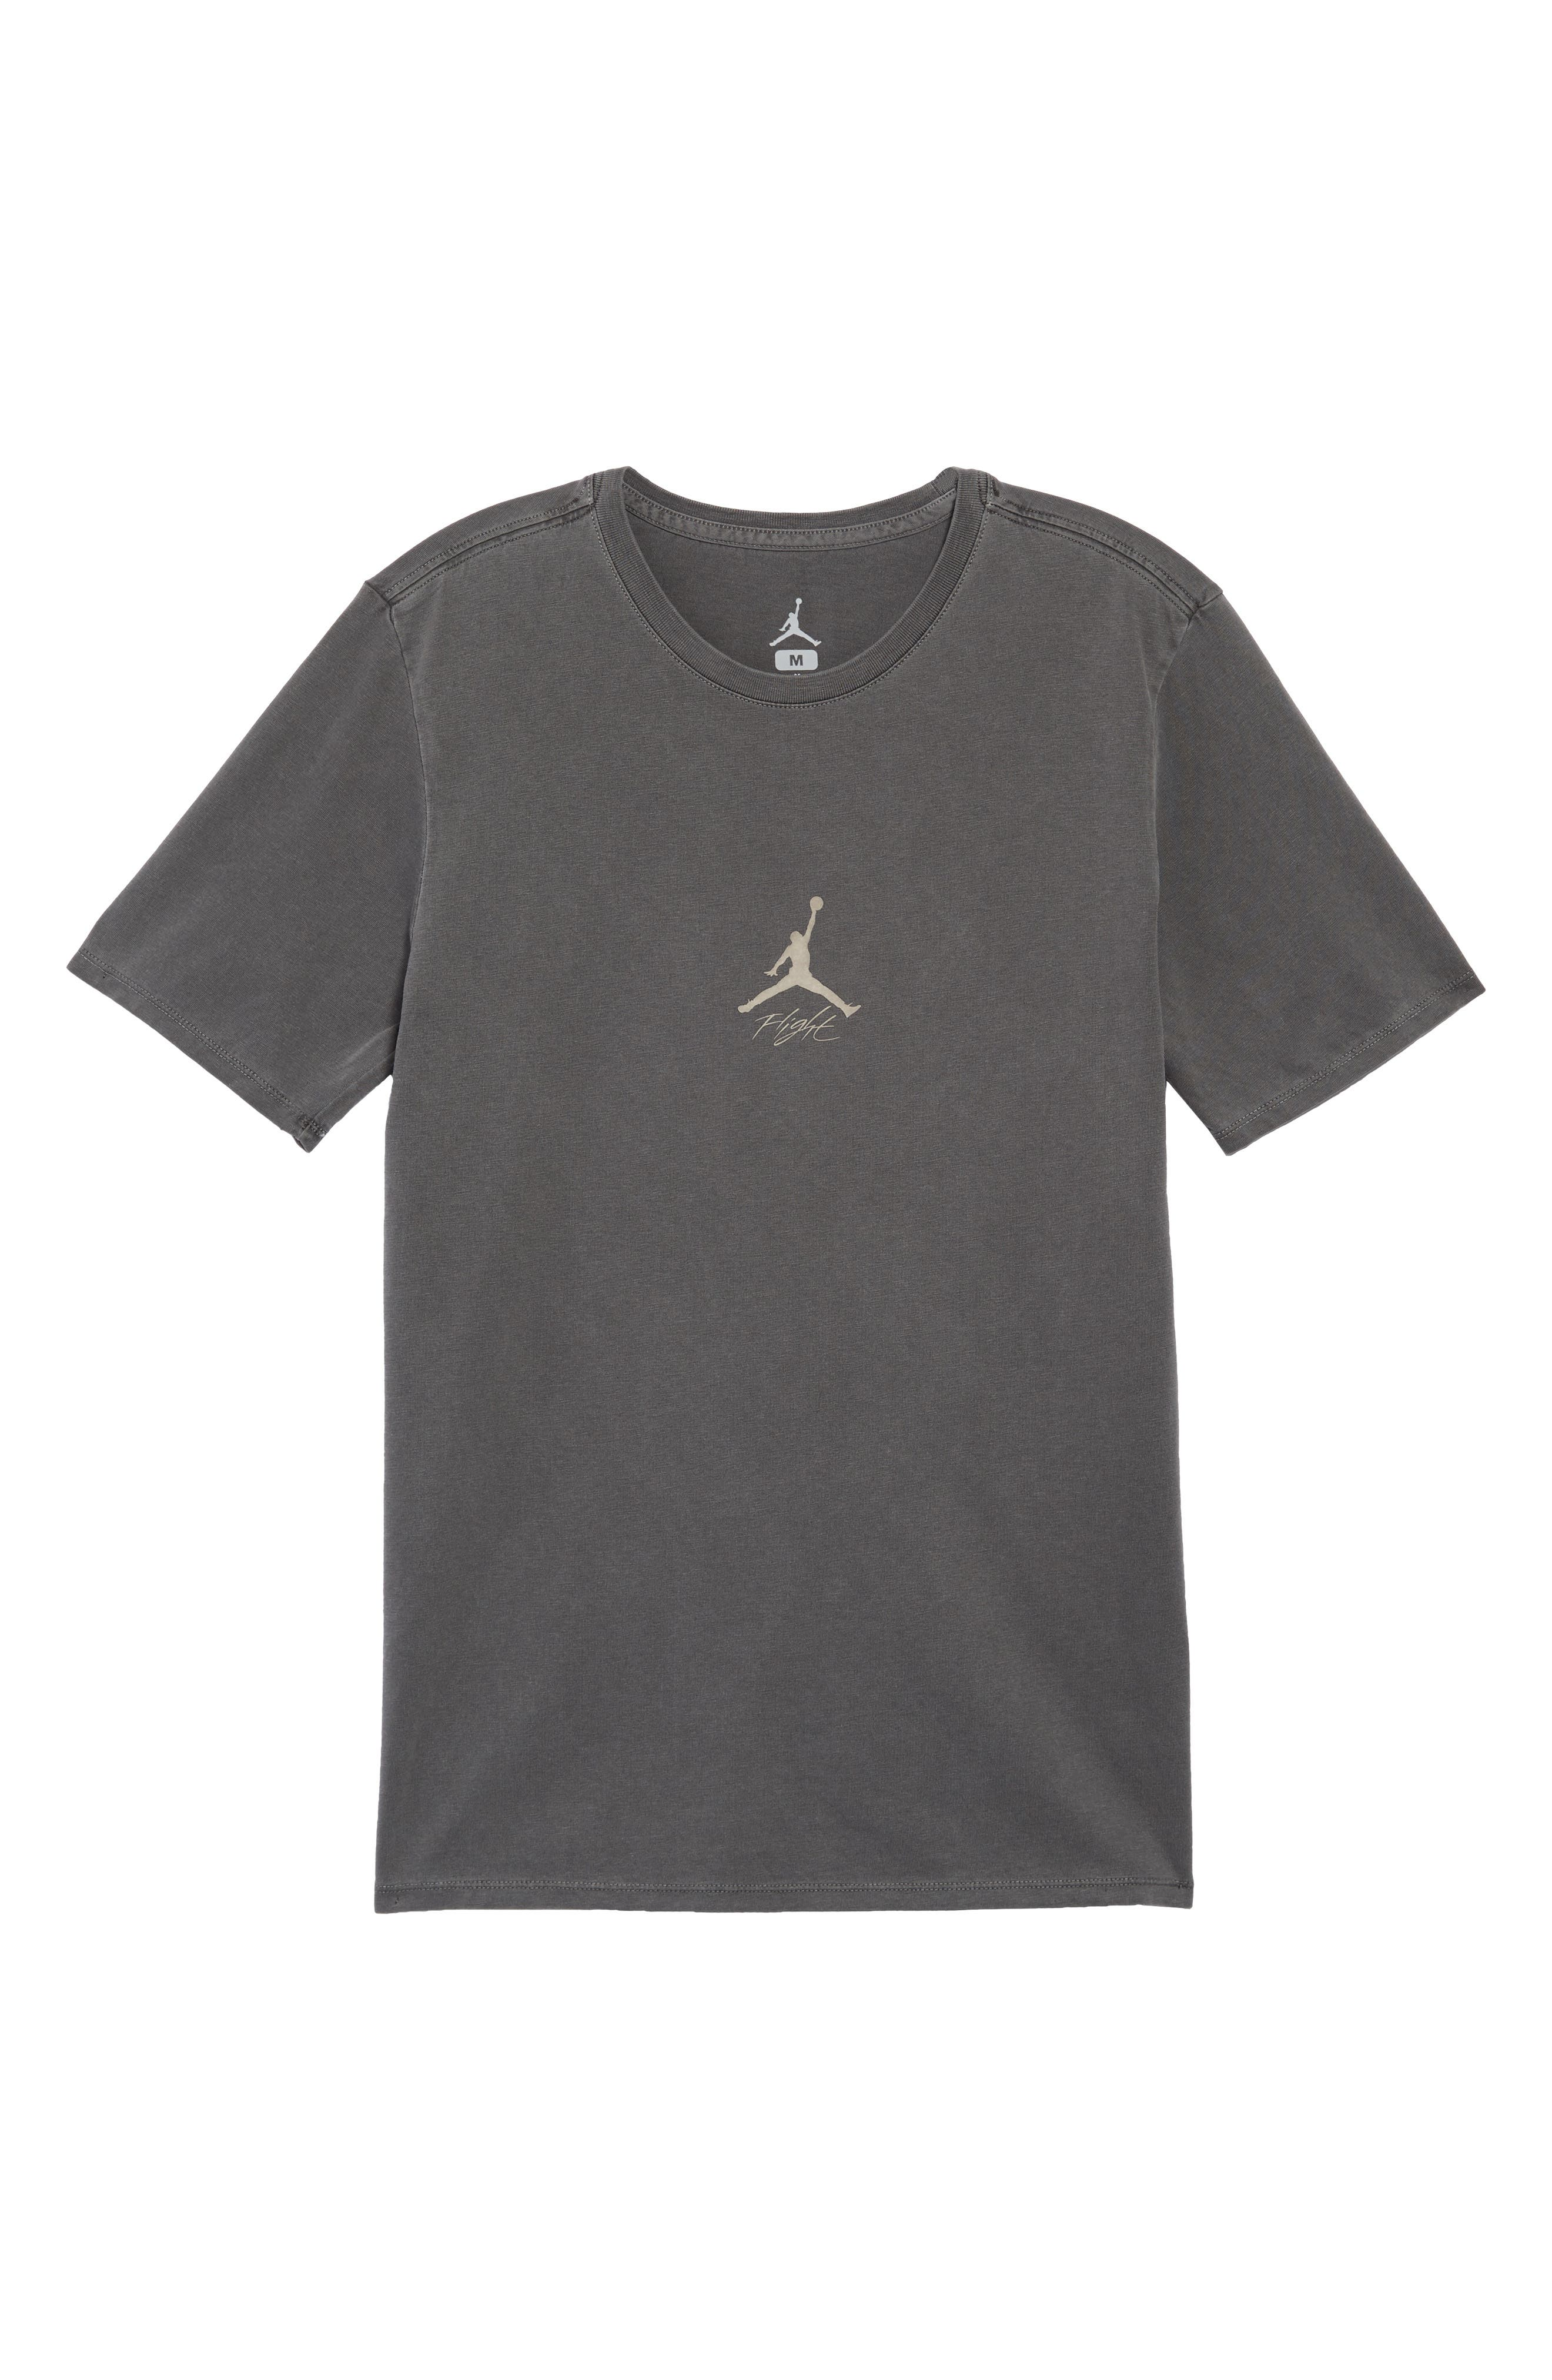 JORDAN,                             Wings Cotton T-Shirtee,                             Alternate thumbnail 6, color,                             010